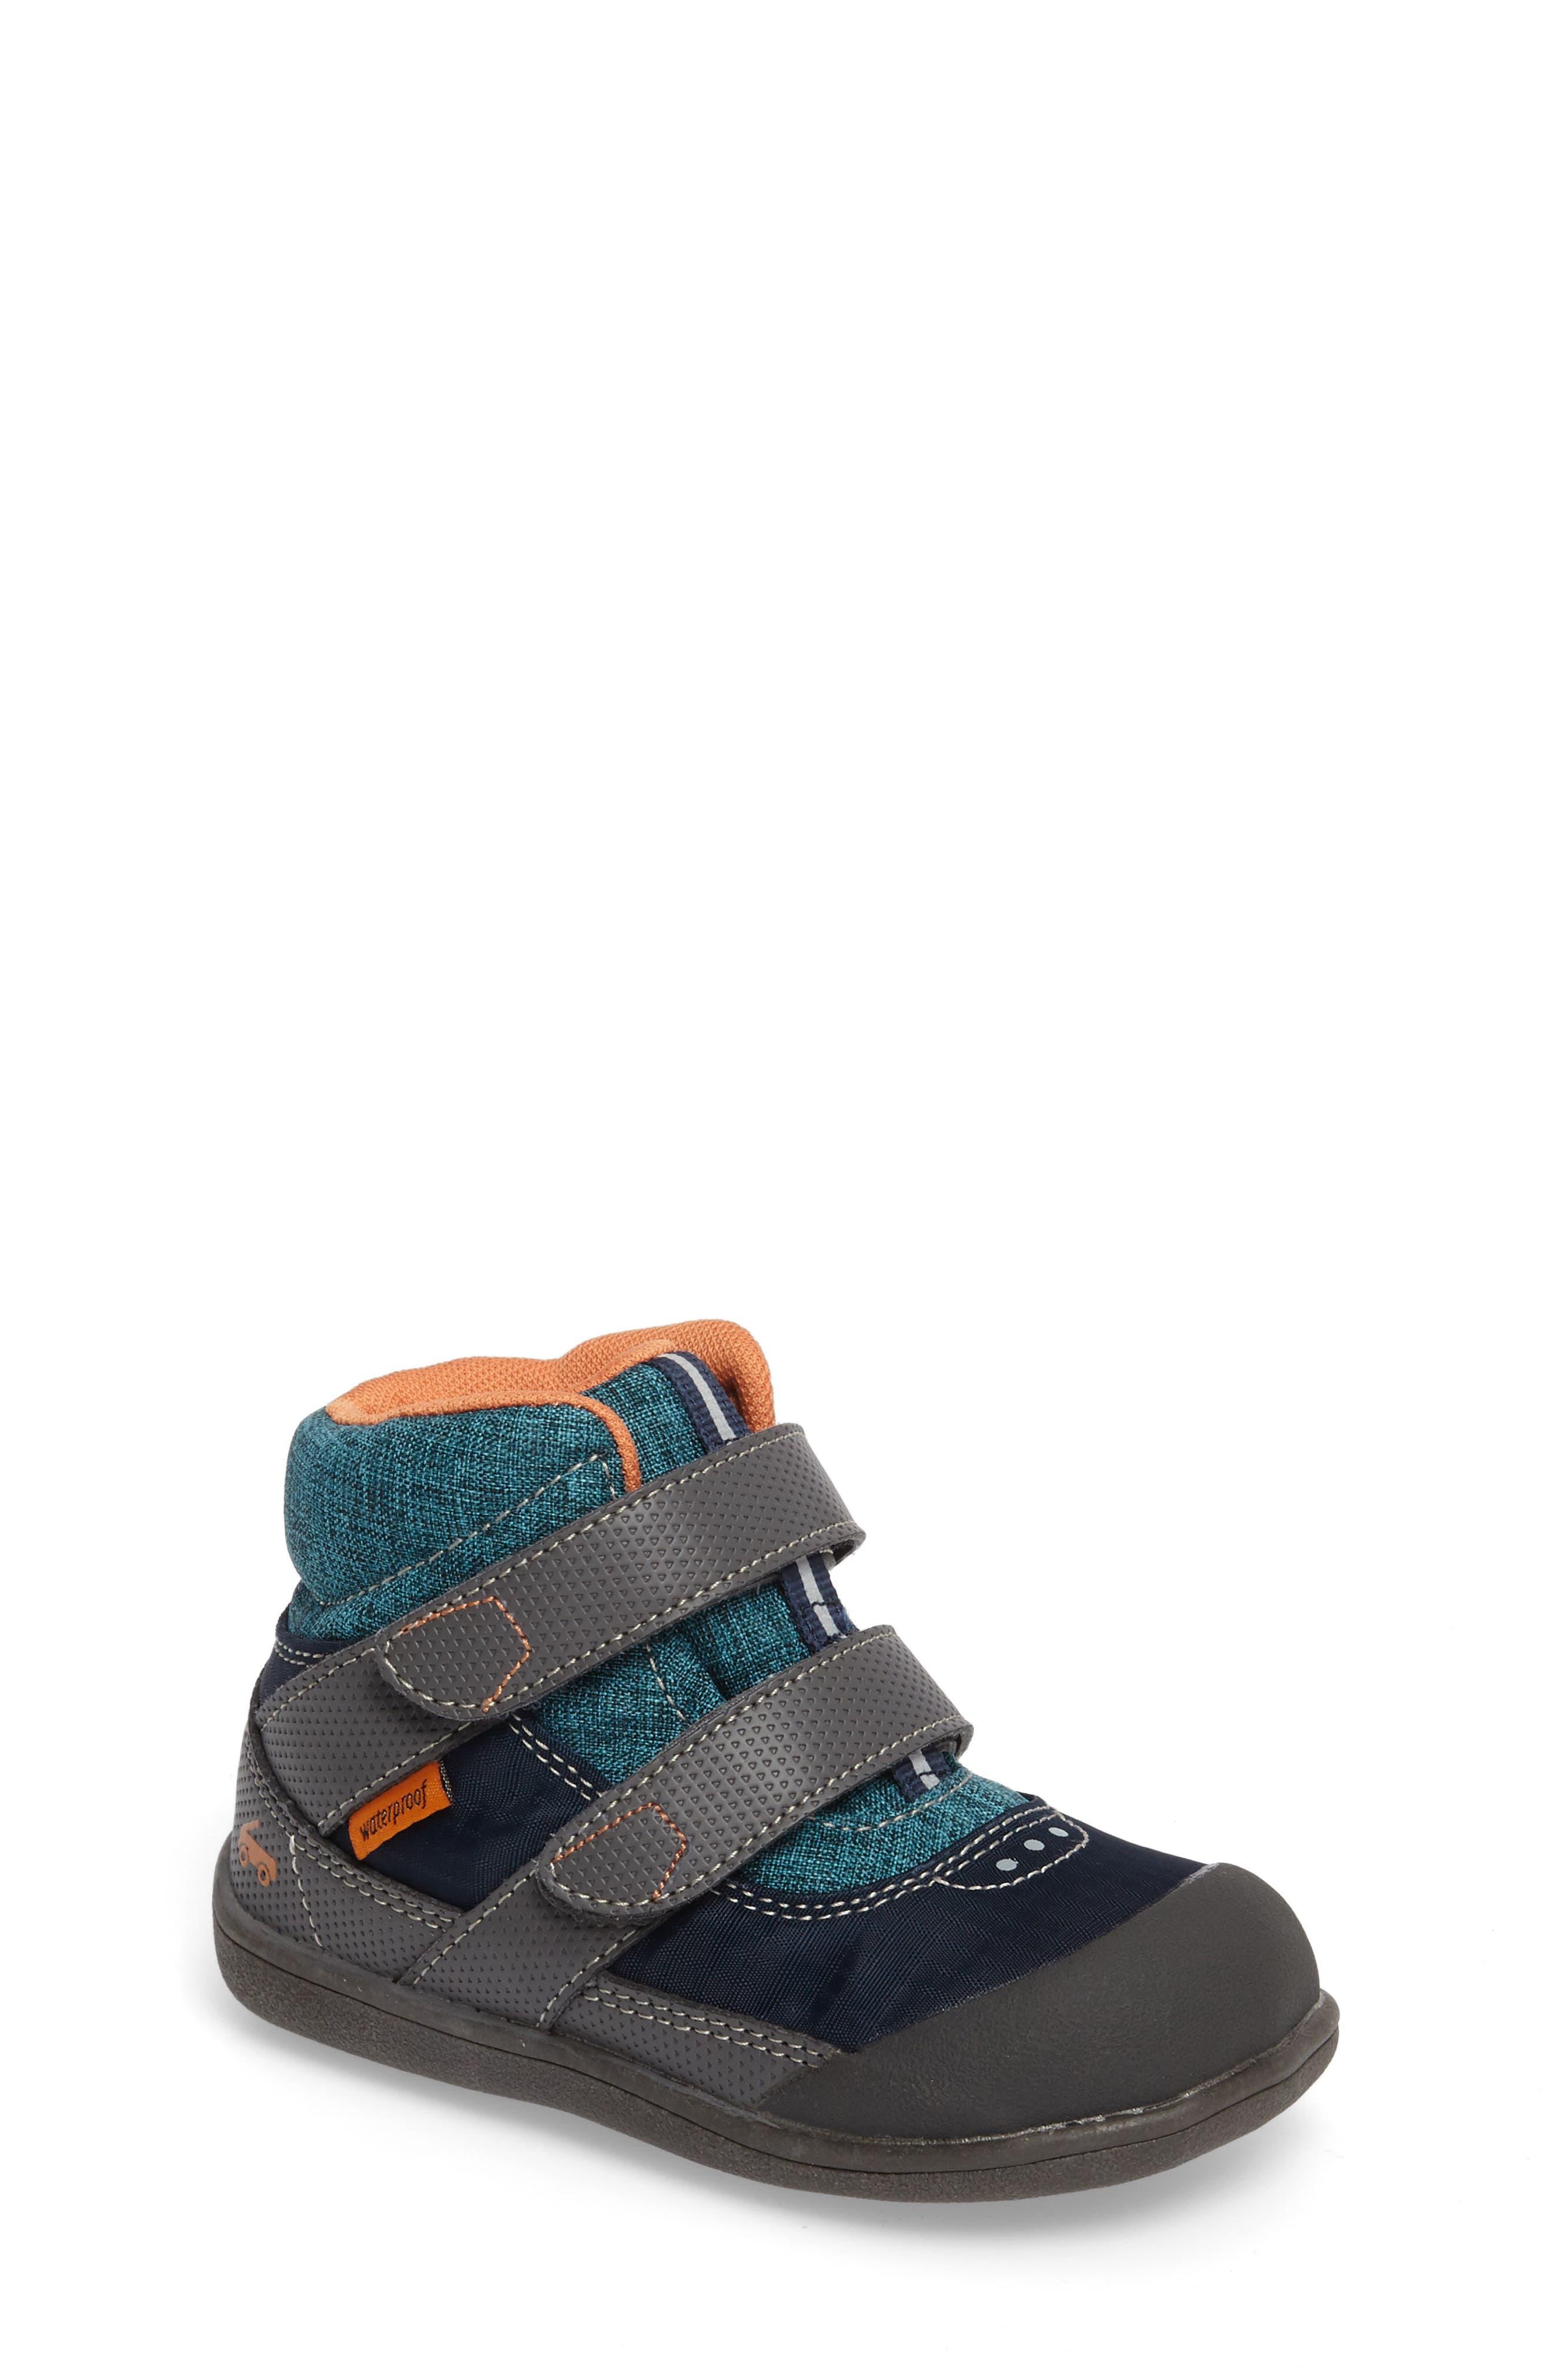 See Kai Run Atlas Waterproof Boot (Baby